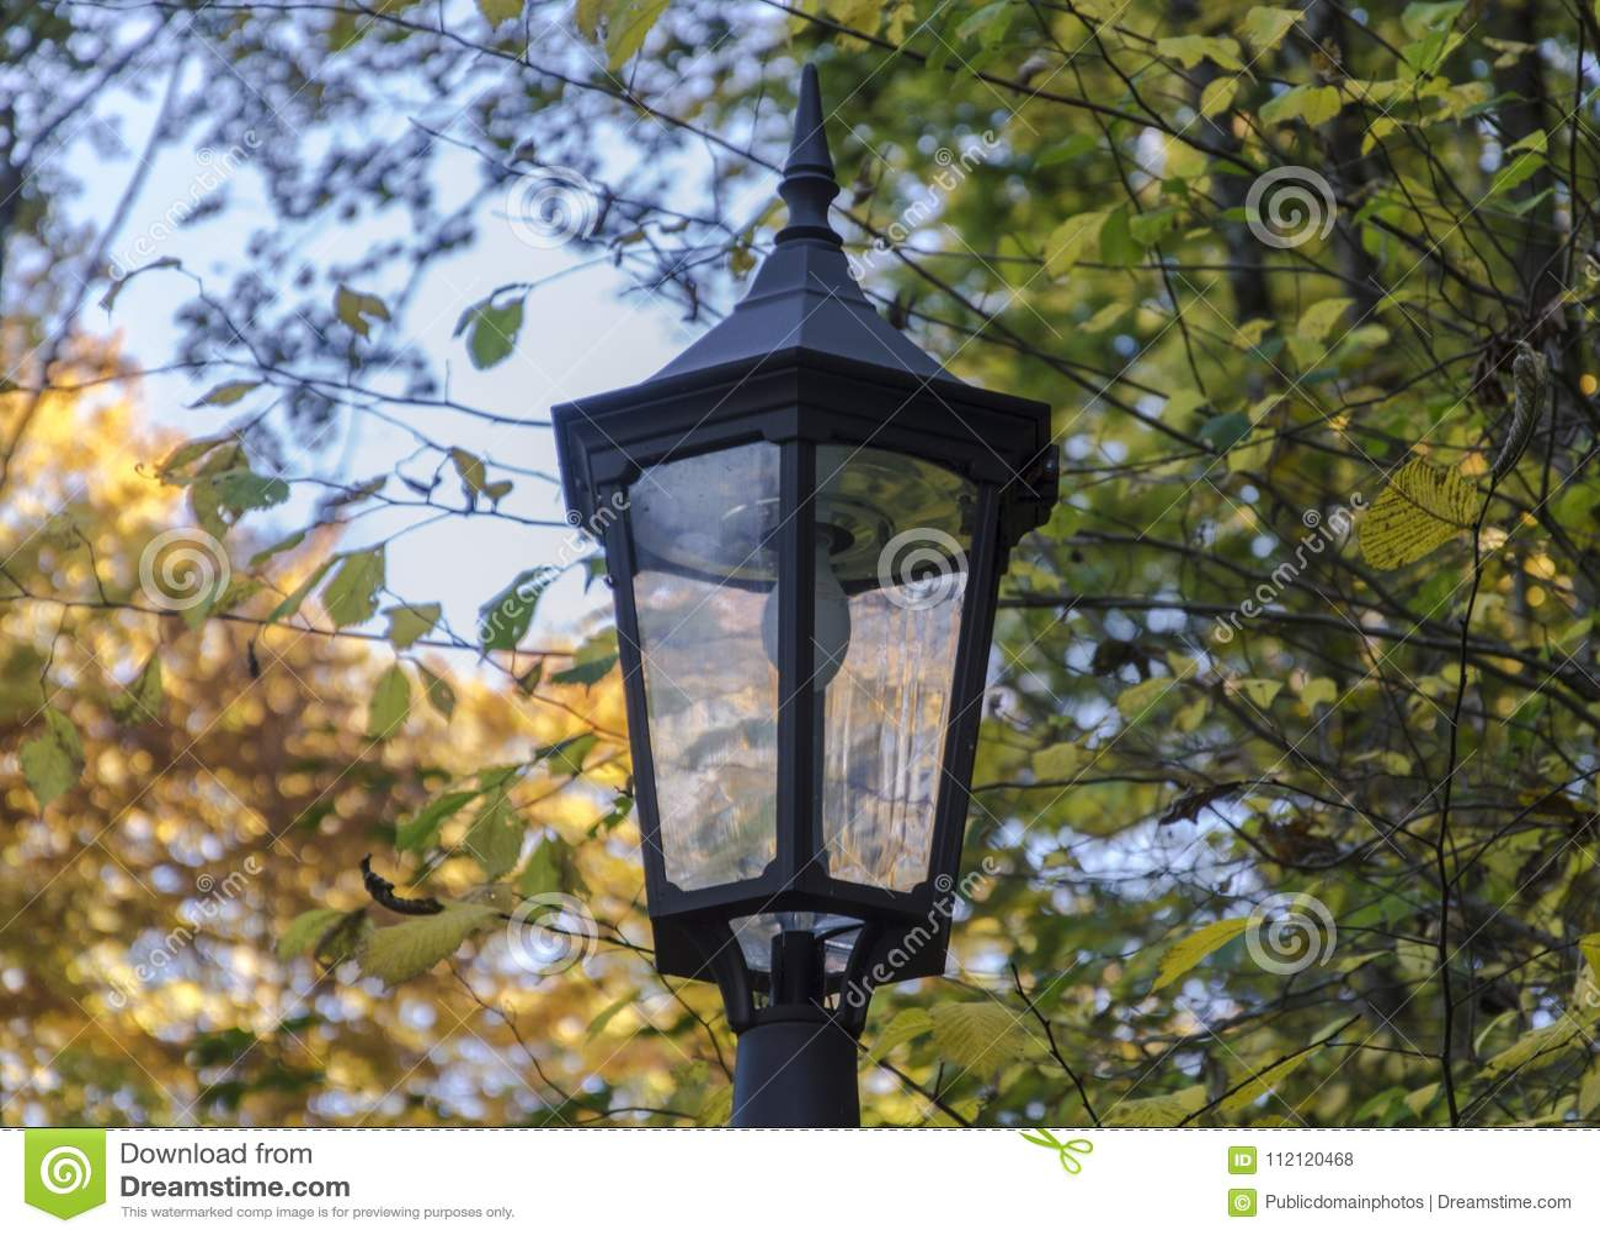 Lighting Bird Feeder Tree Branch Picture Image 112120468